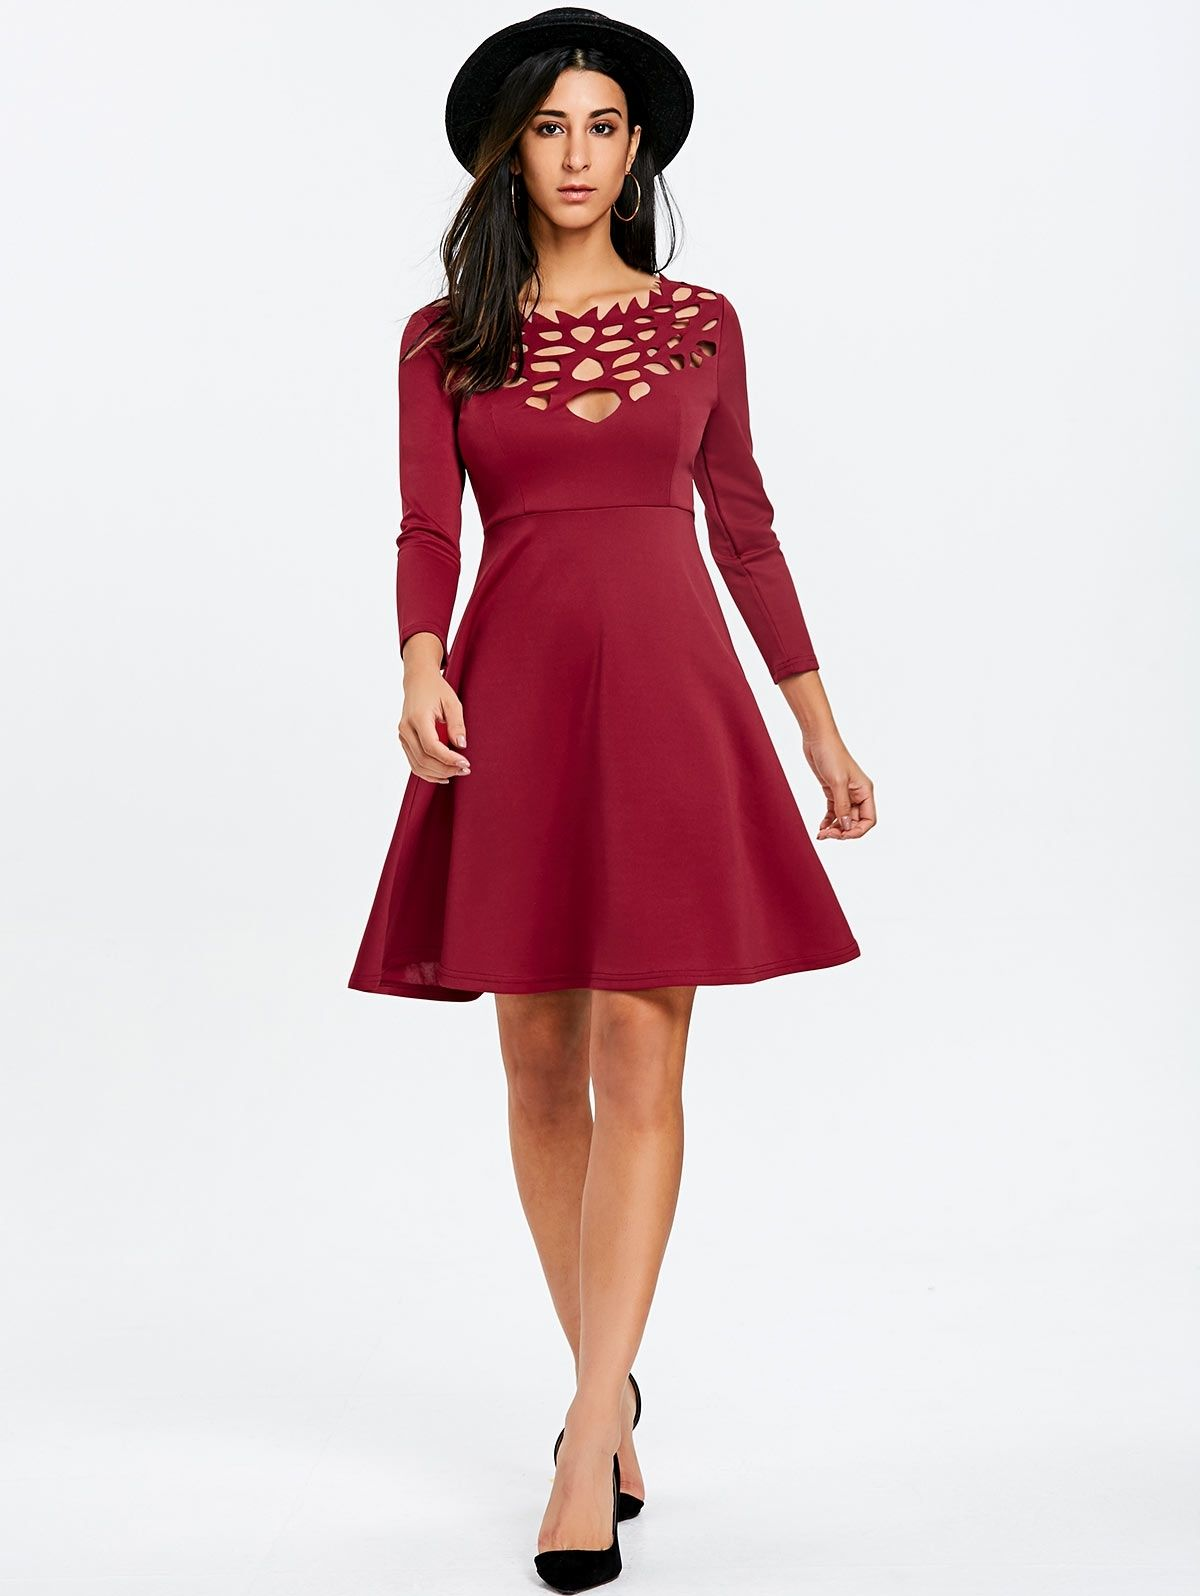 DRESSFO Cut Out Mini Party Skater Dress - WINE RED  0f715c3de